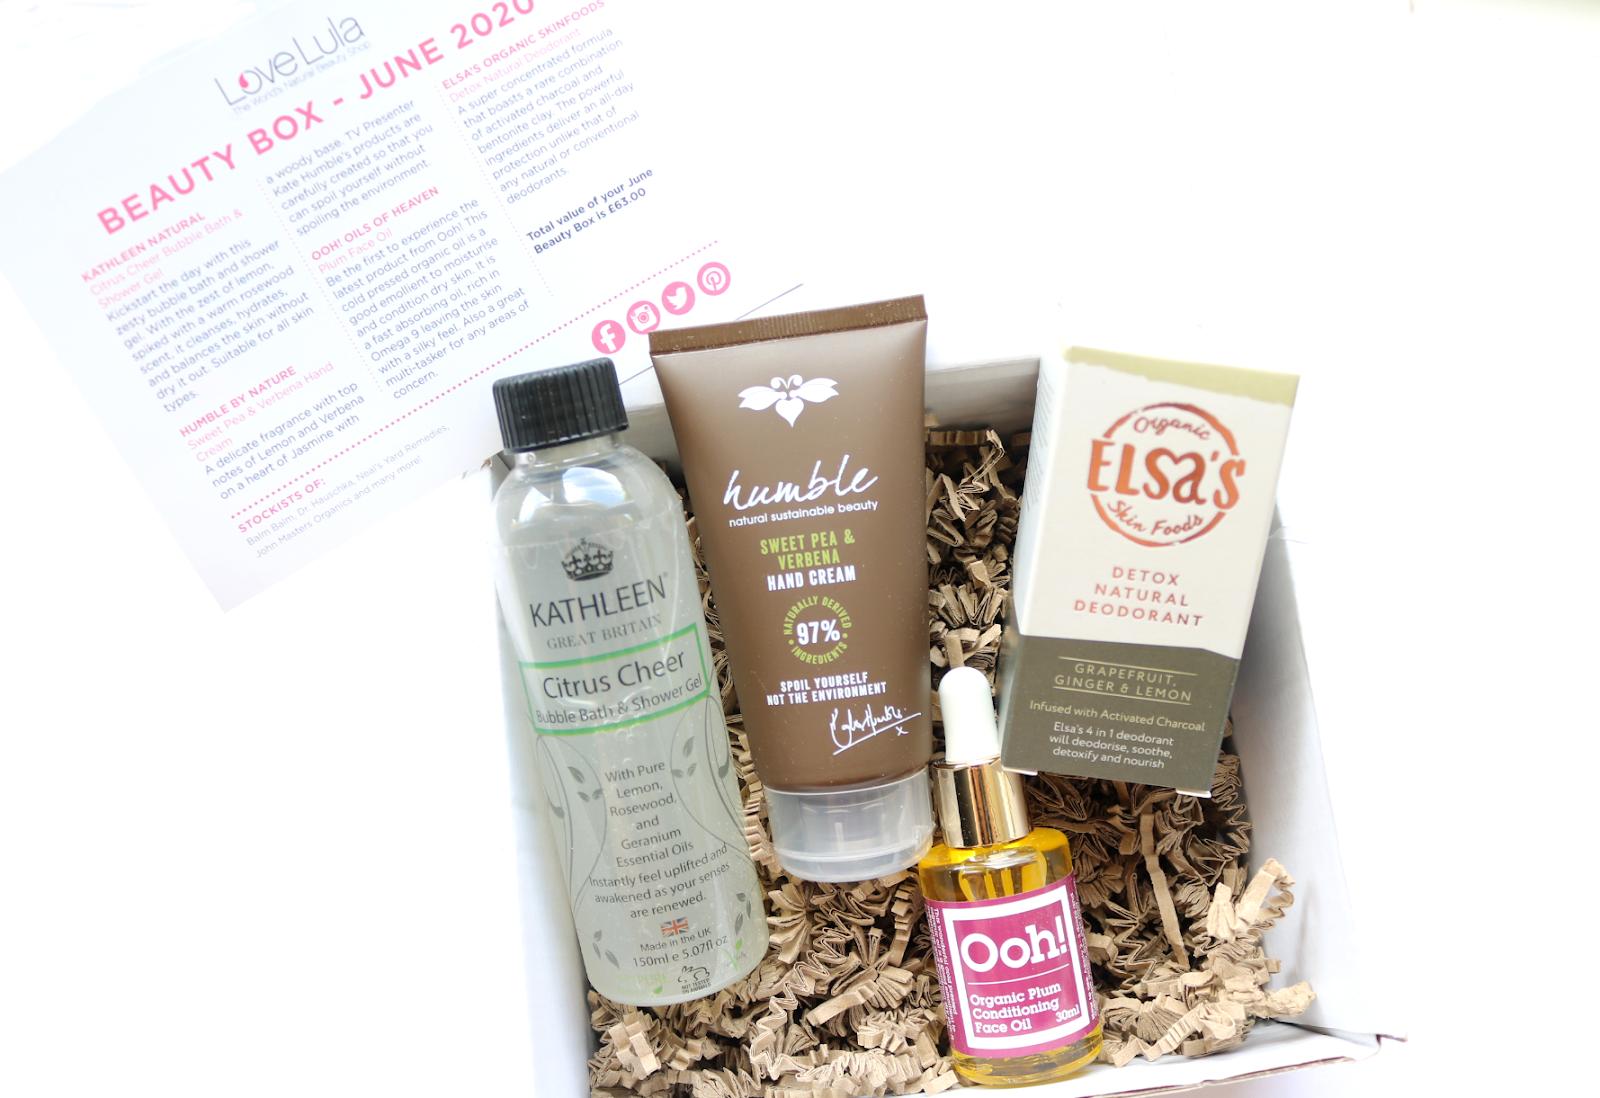 Green Beauty: LoveLula Beauty Box - June 2020 review